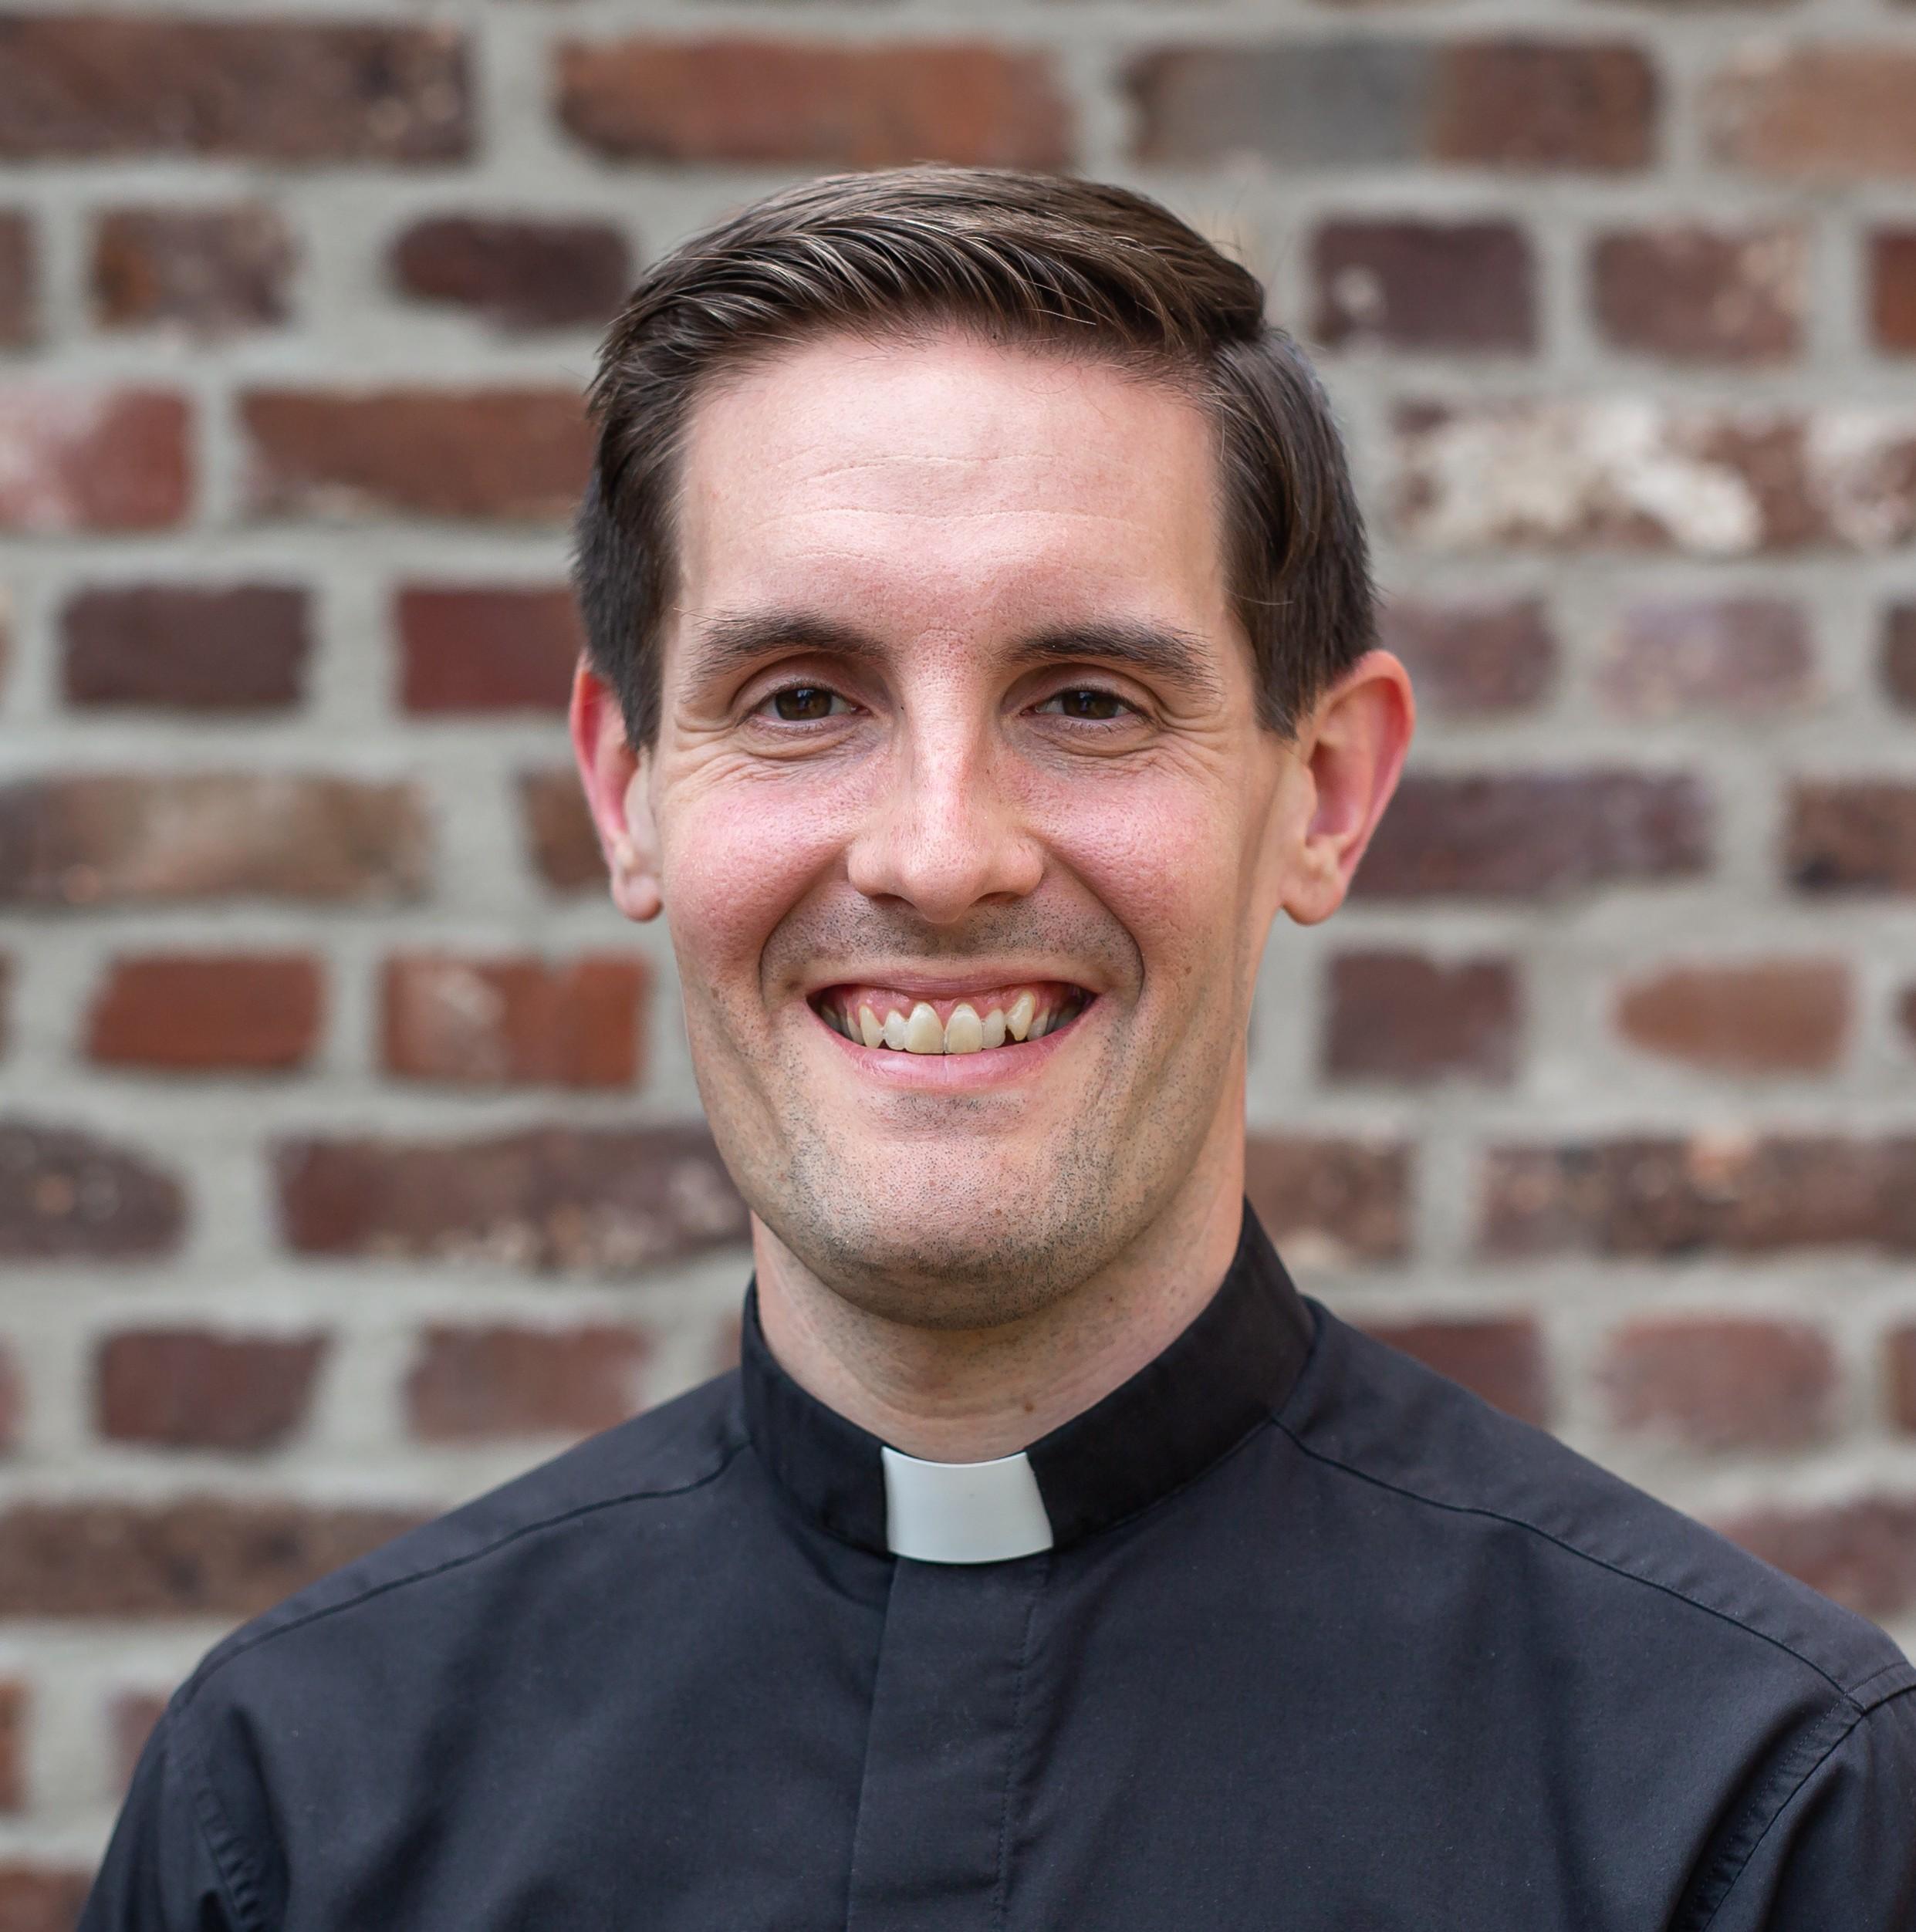 Fr. Michael Baggot, LC